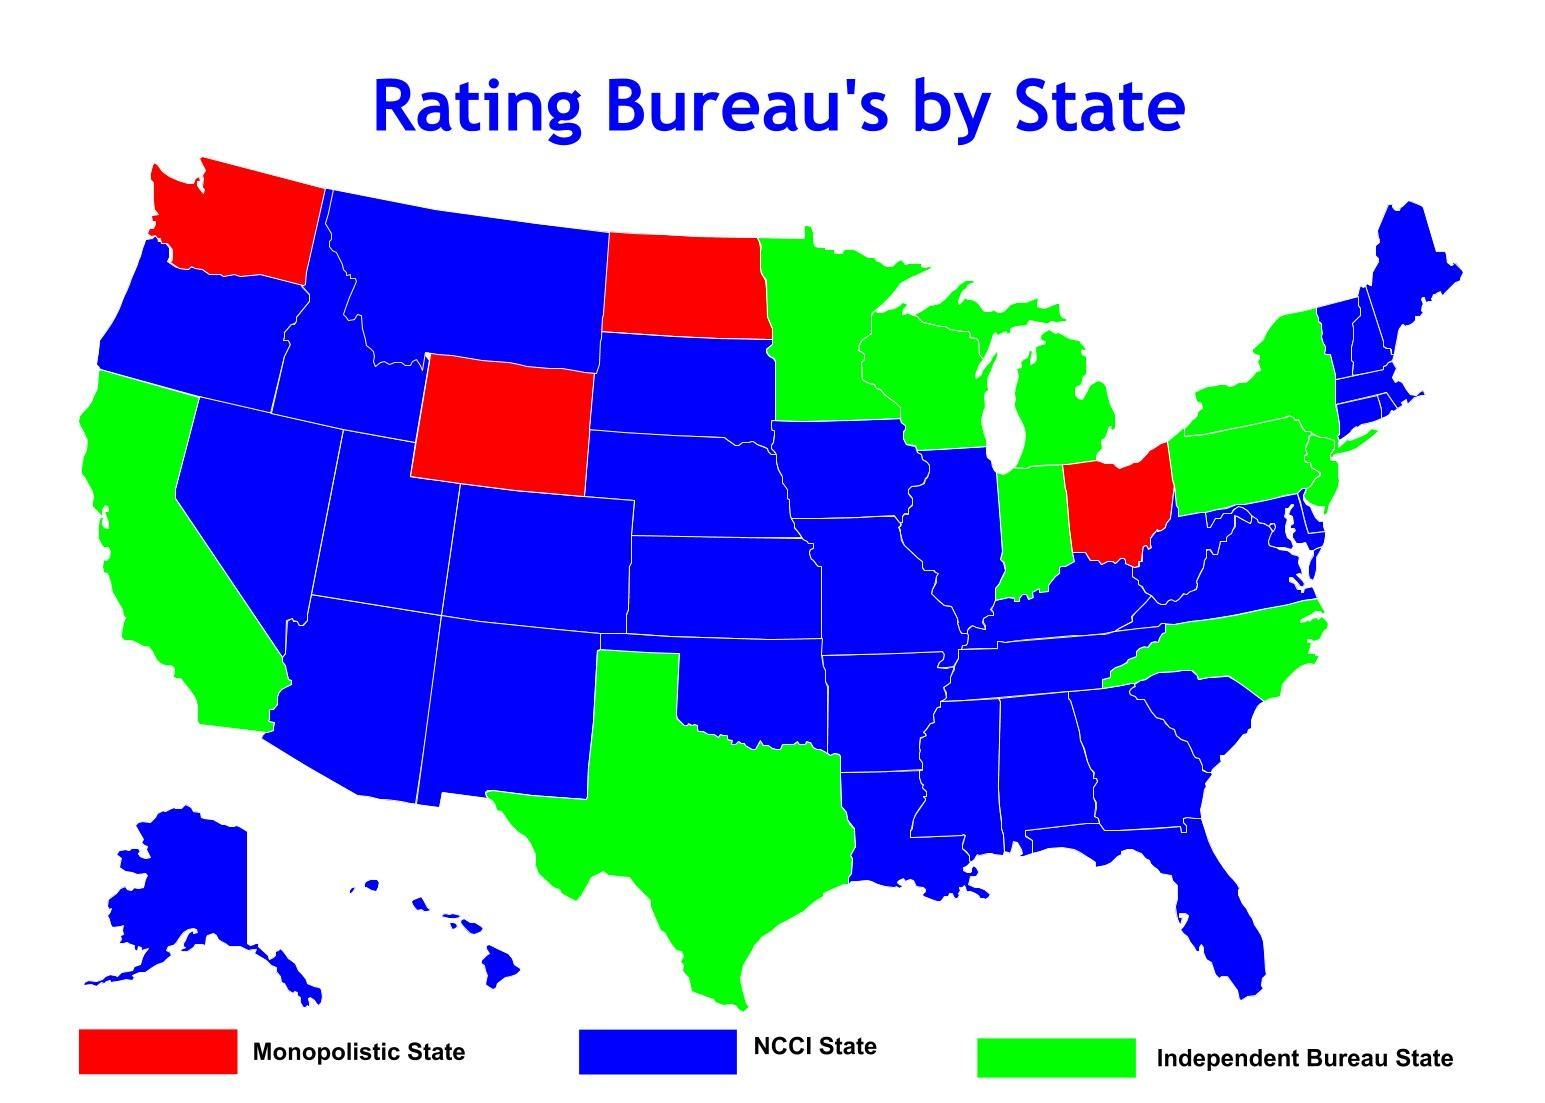 Ncci States Monopolistic States And Independent Bureau States